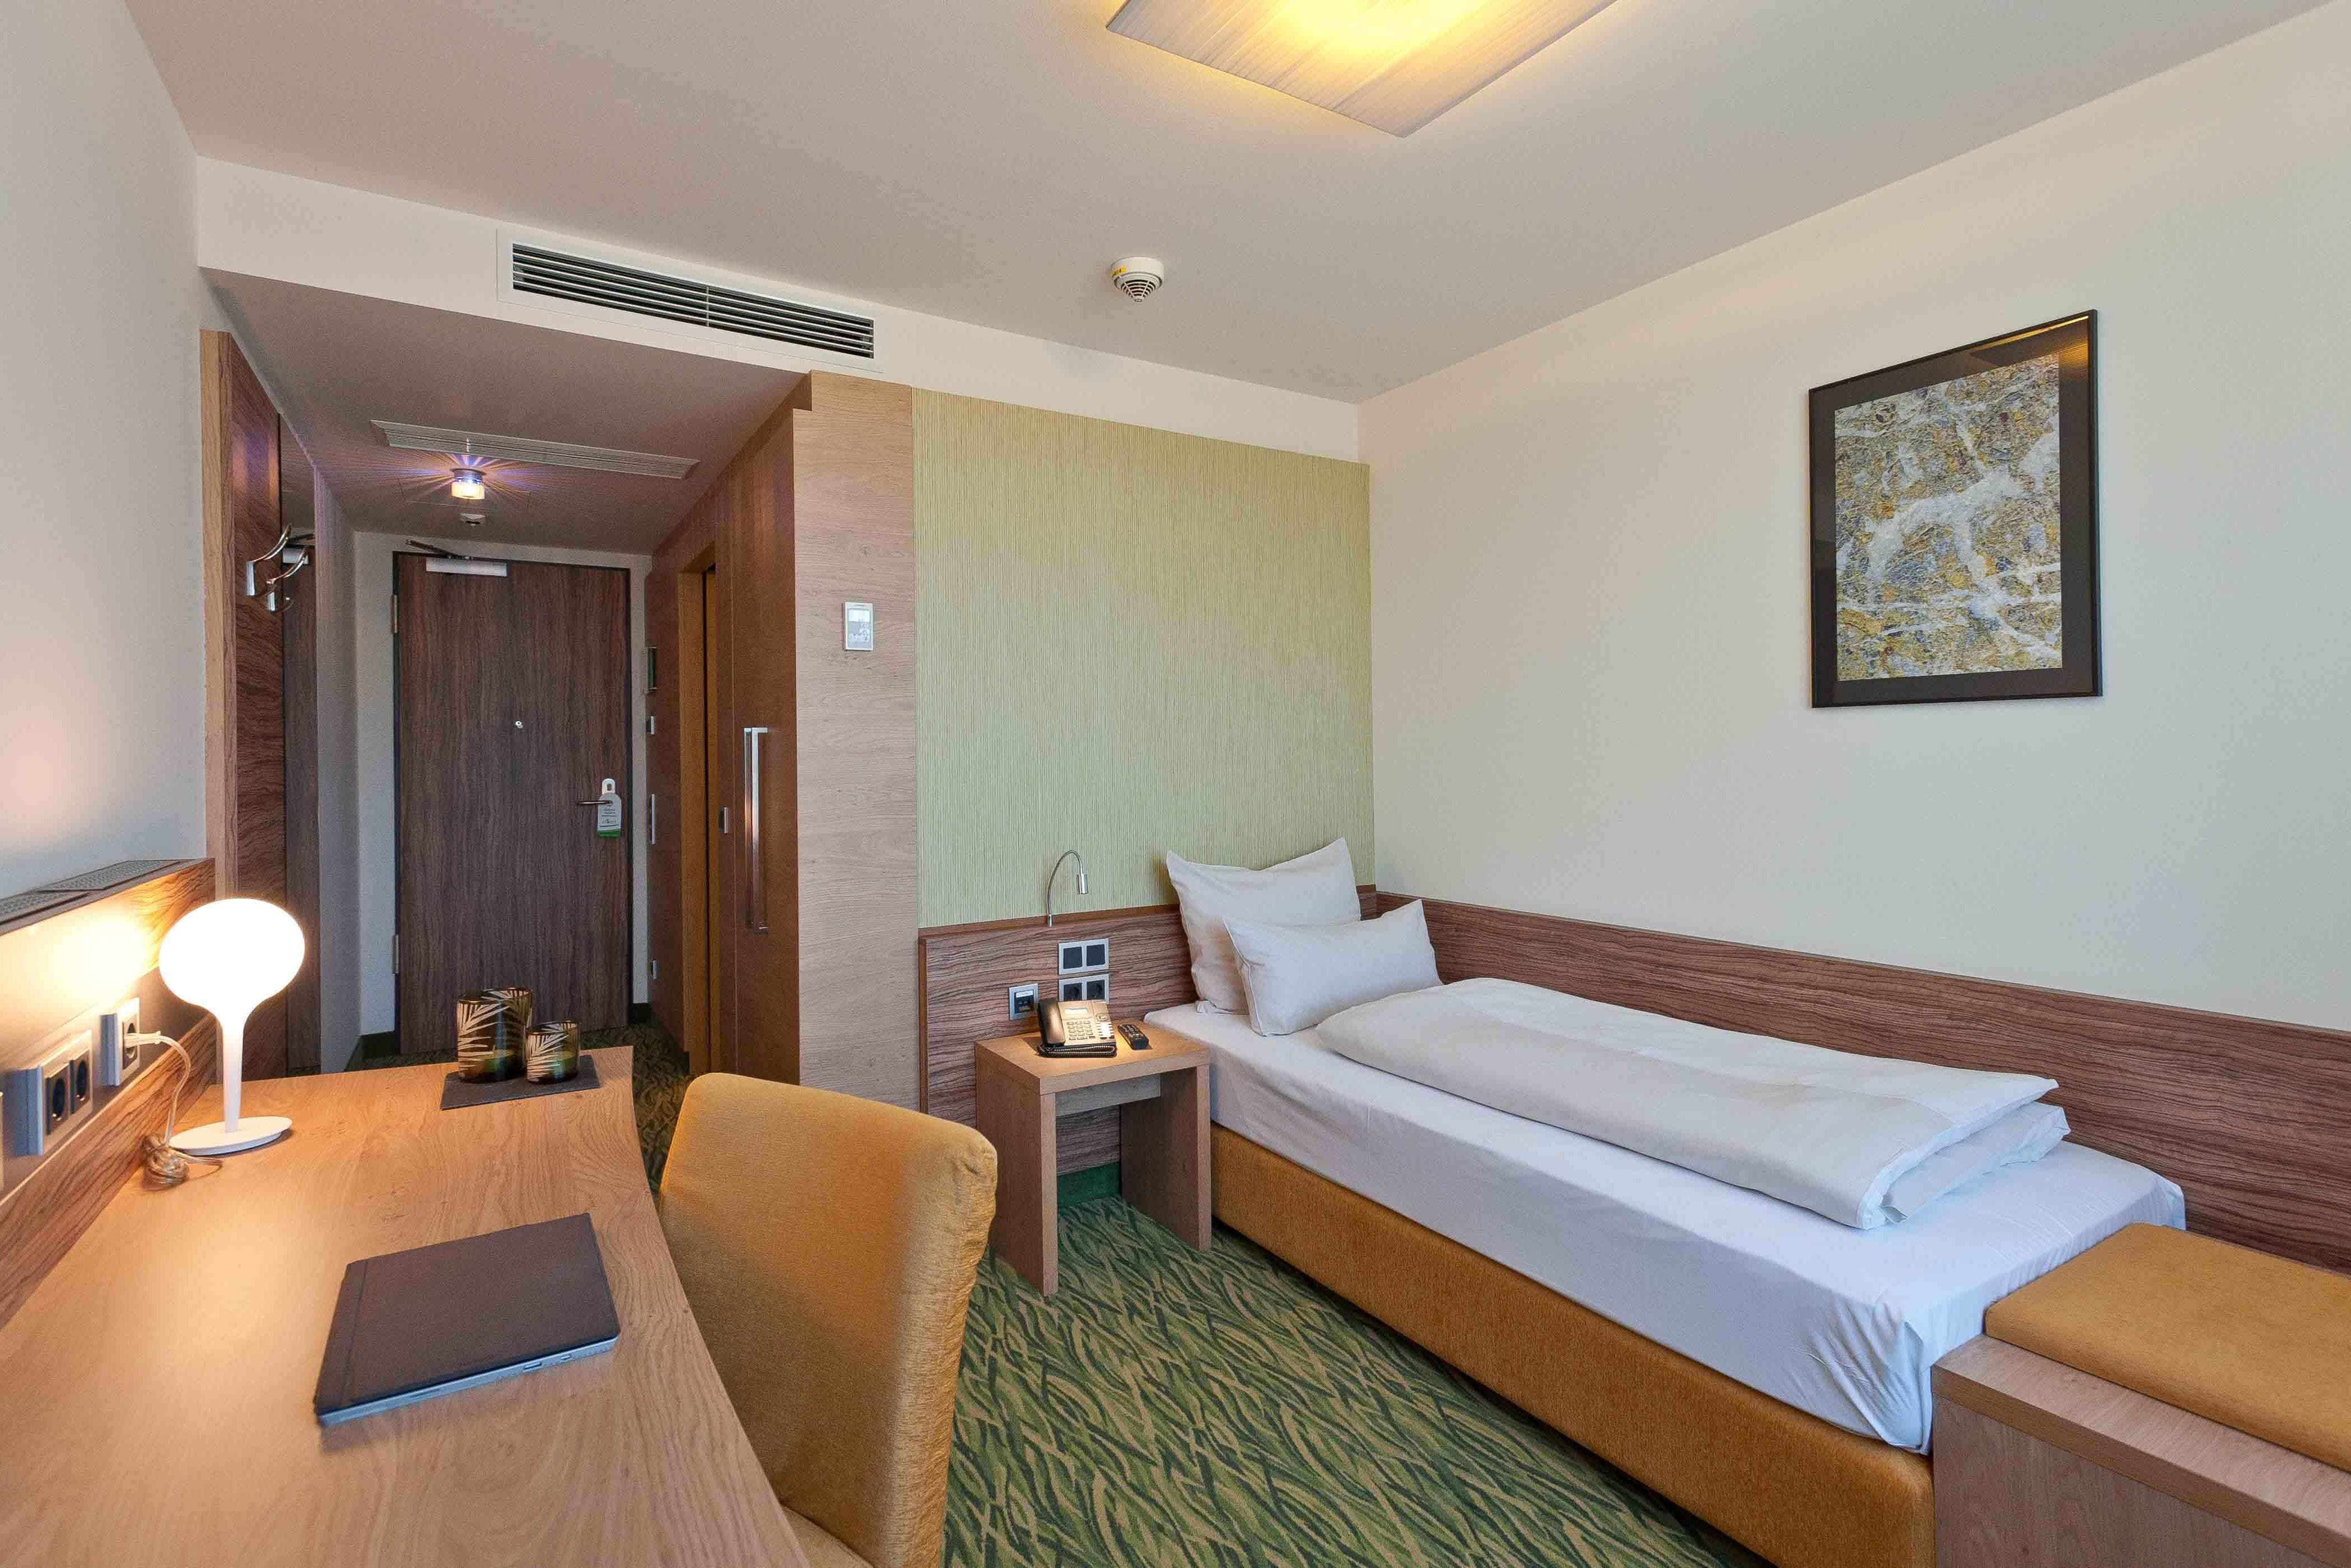 Mini Kühlschrank Zimmer : Single room hotel bildungsblick